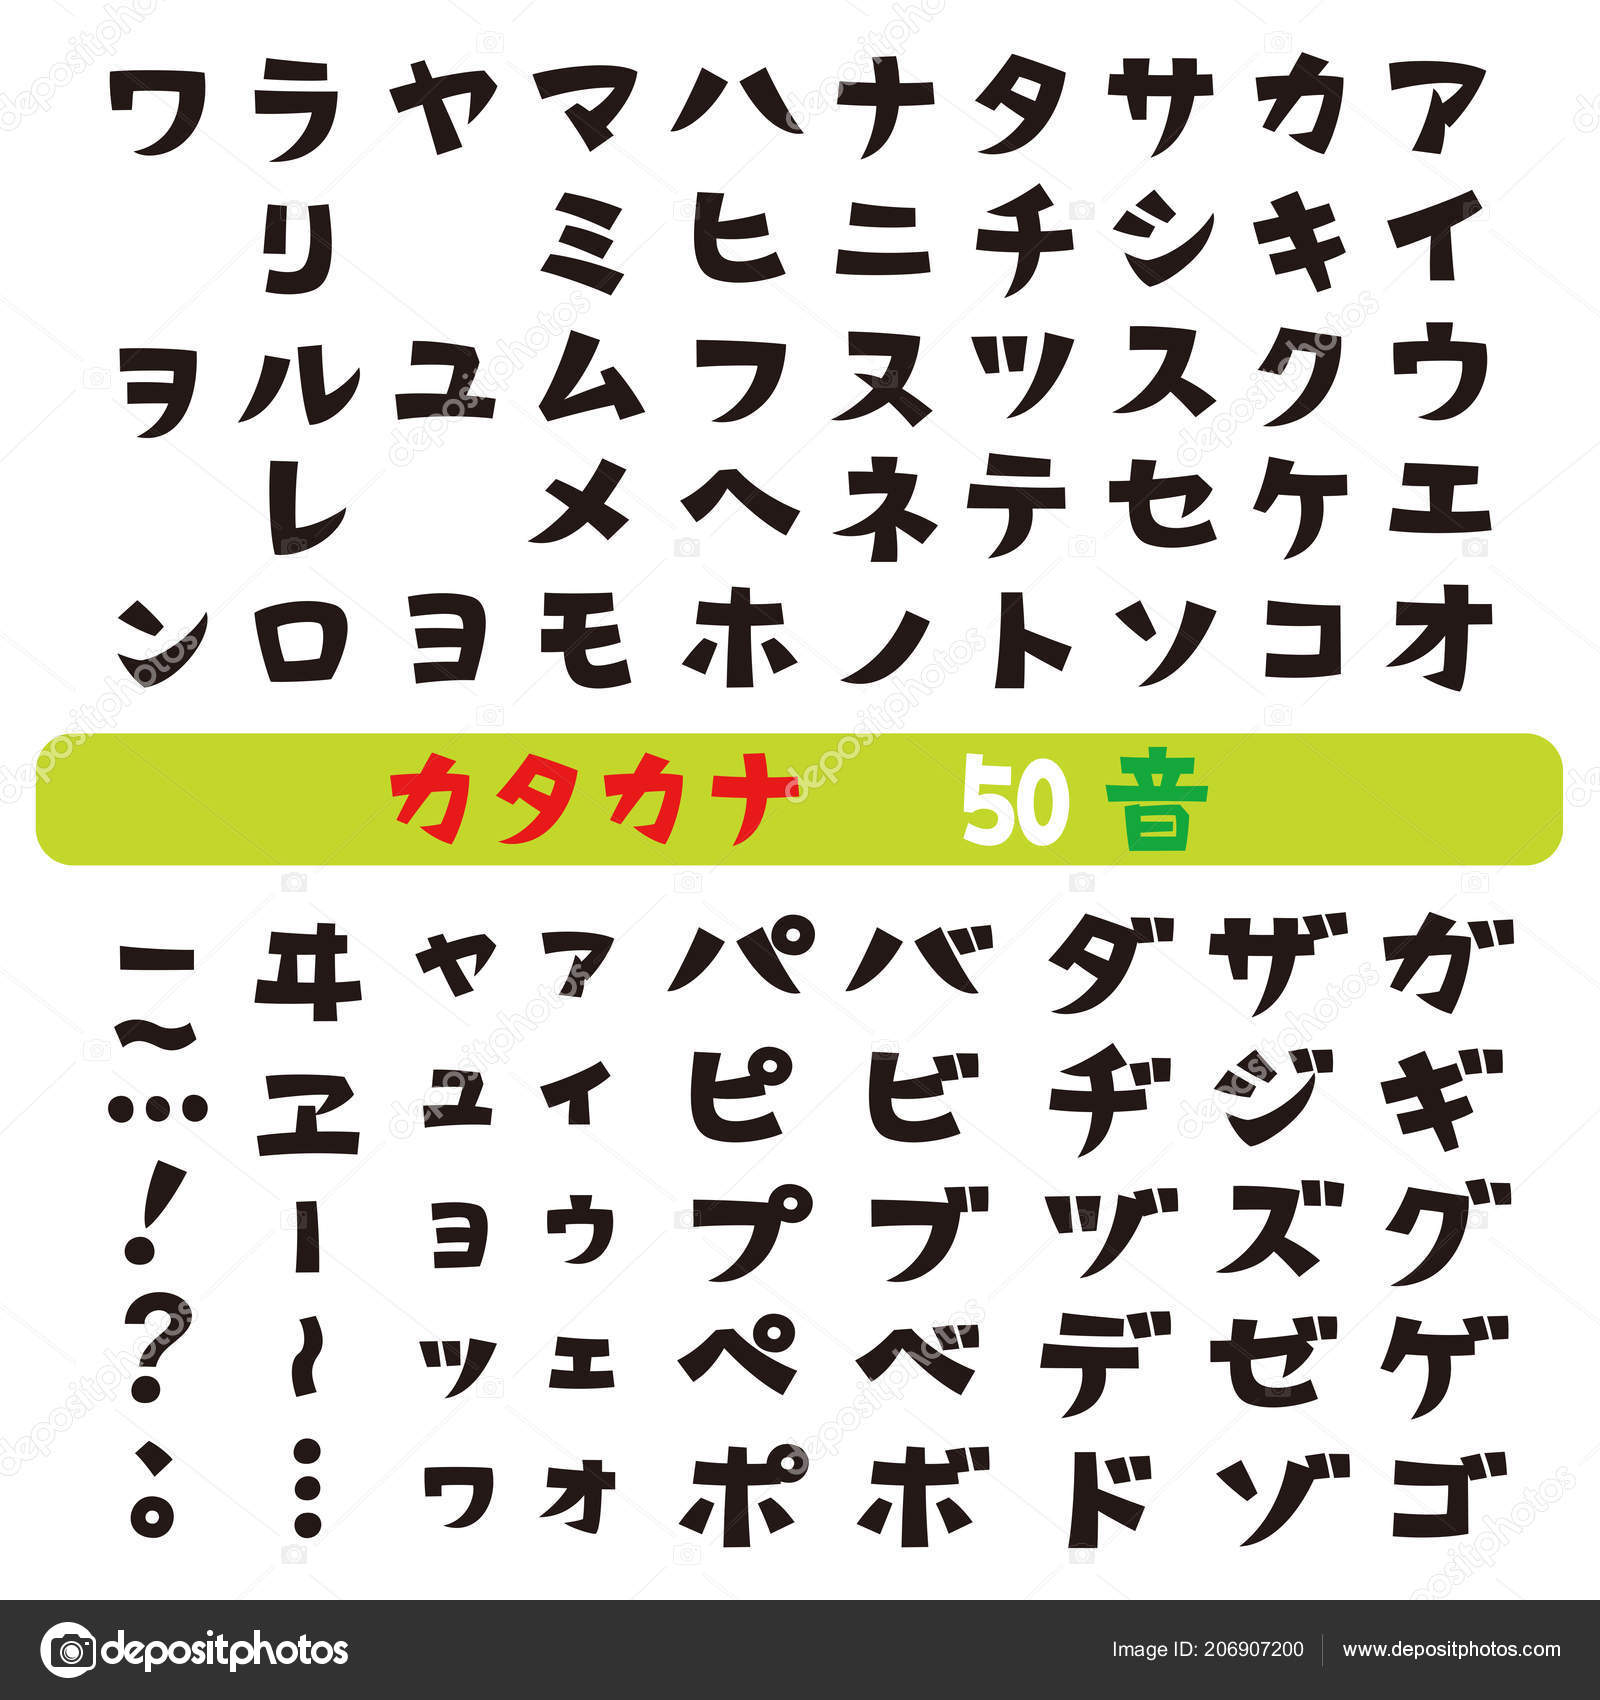 Japanese Katakana Fonts Vector Set — Stock Vector © niow